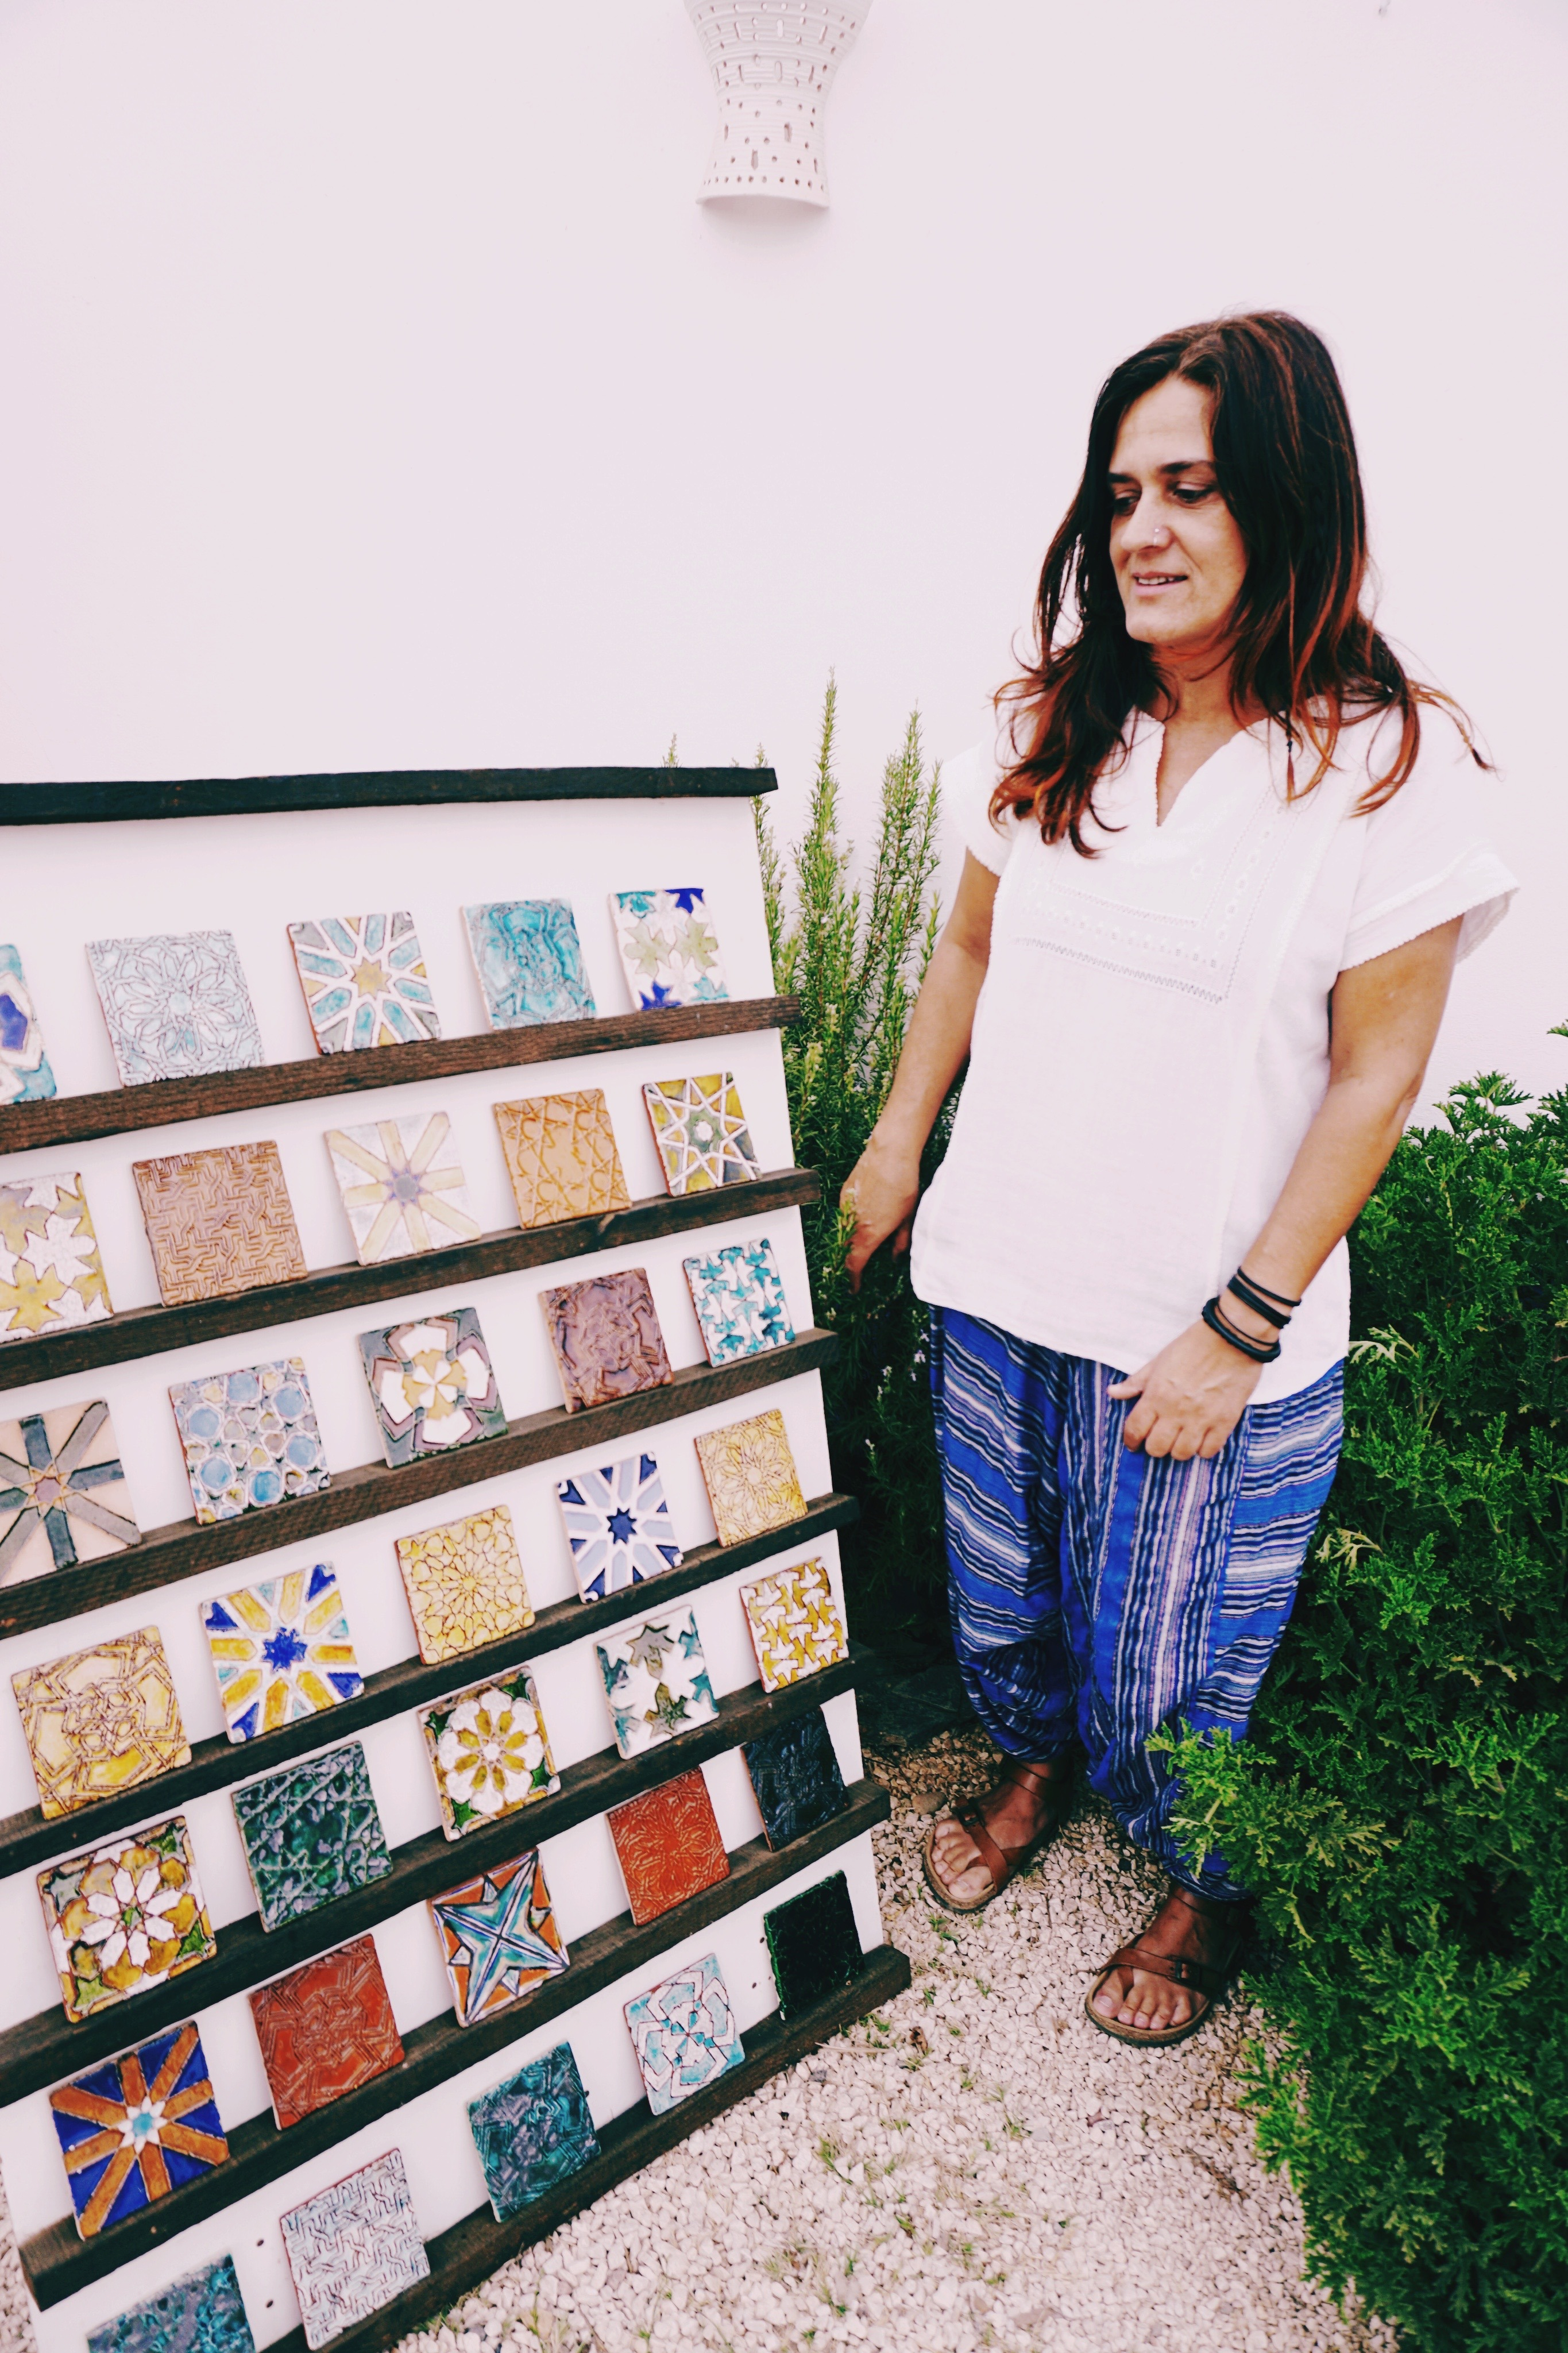 Rita Silvério Morais - a Portuguese artist with her work of intricately detailed Azulejos